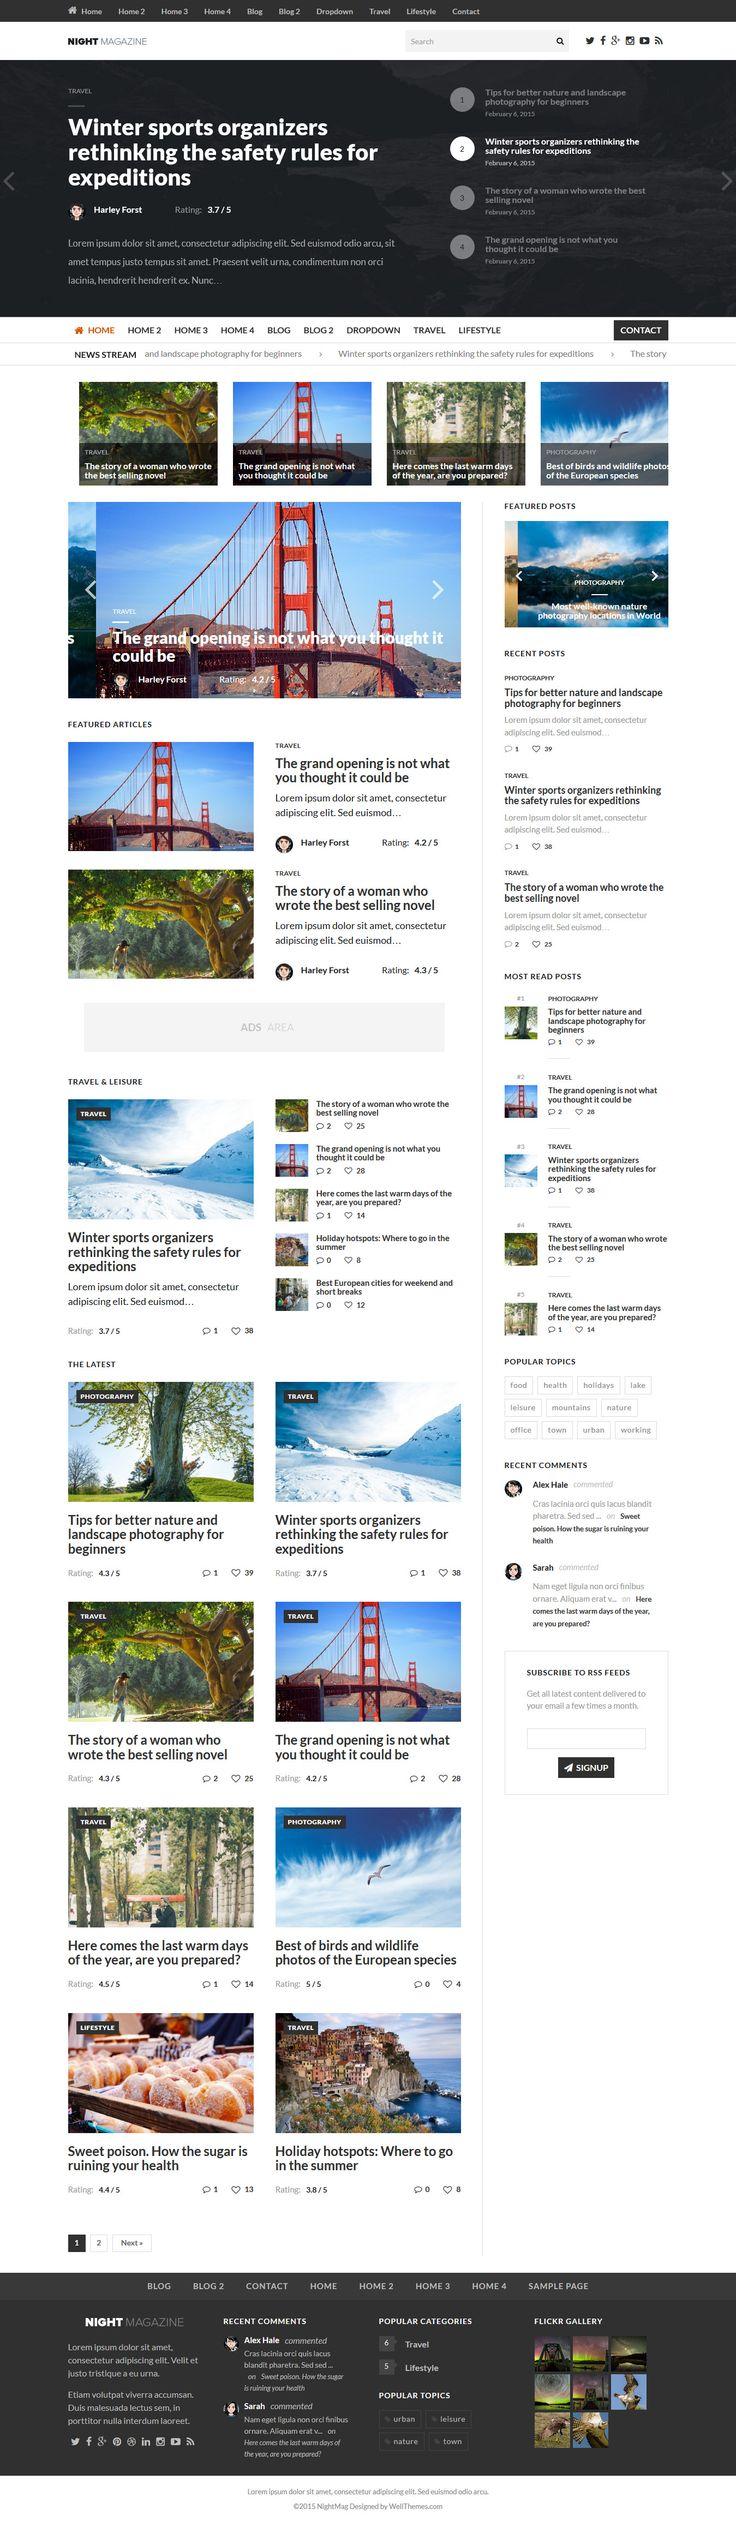 Night - WordPress News and Magazine Wordpress Theme #web #wordpress Live Preview and Download: http://themeforest.net/item/night-wordpress-news-and-magazine-theme/10379250?ref=ksioks